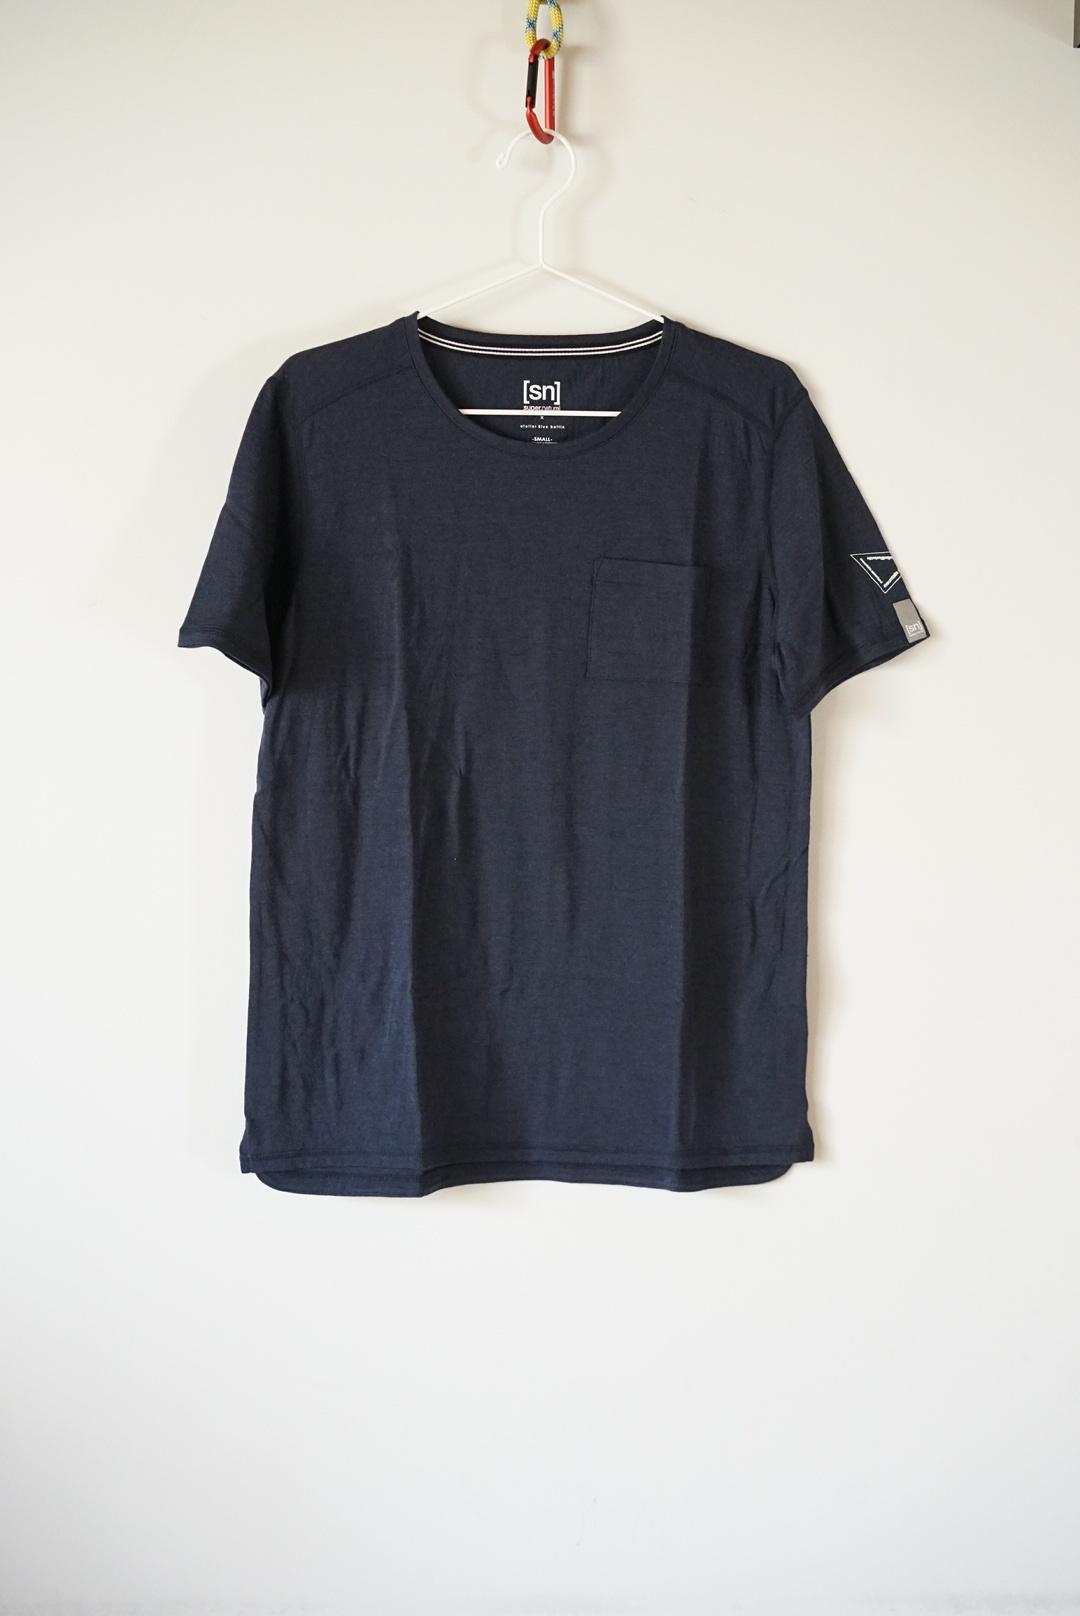 Off the Grid 2018(6/9-10)にて、Hiker's T-shirtを販売